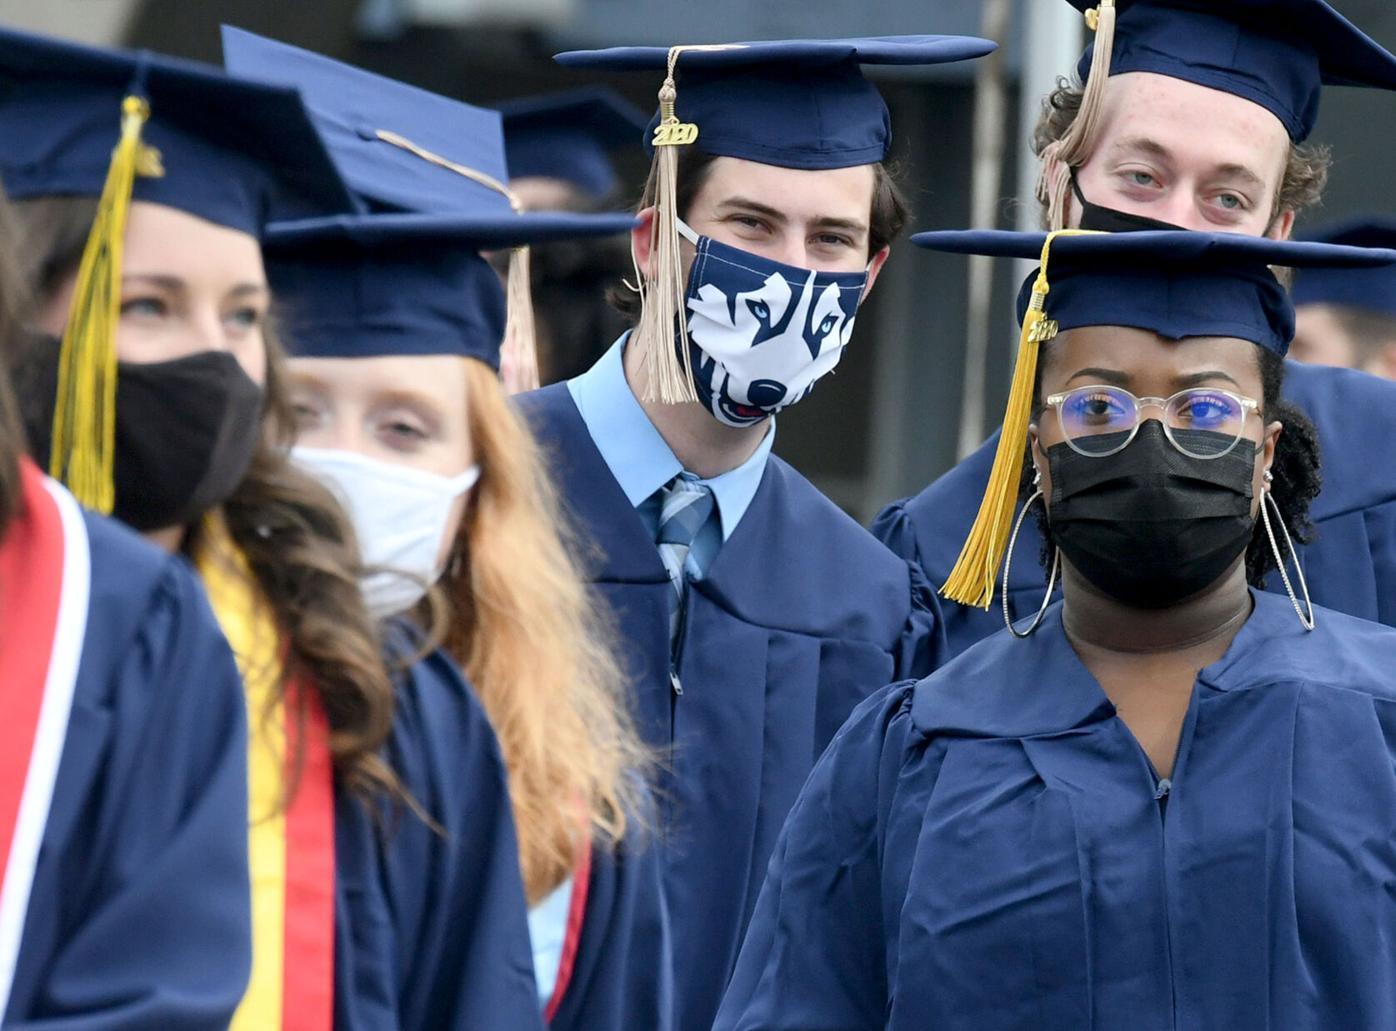 050821 EH UConn Graduation 01.jpg